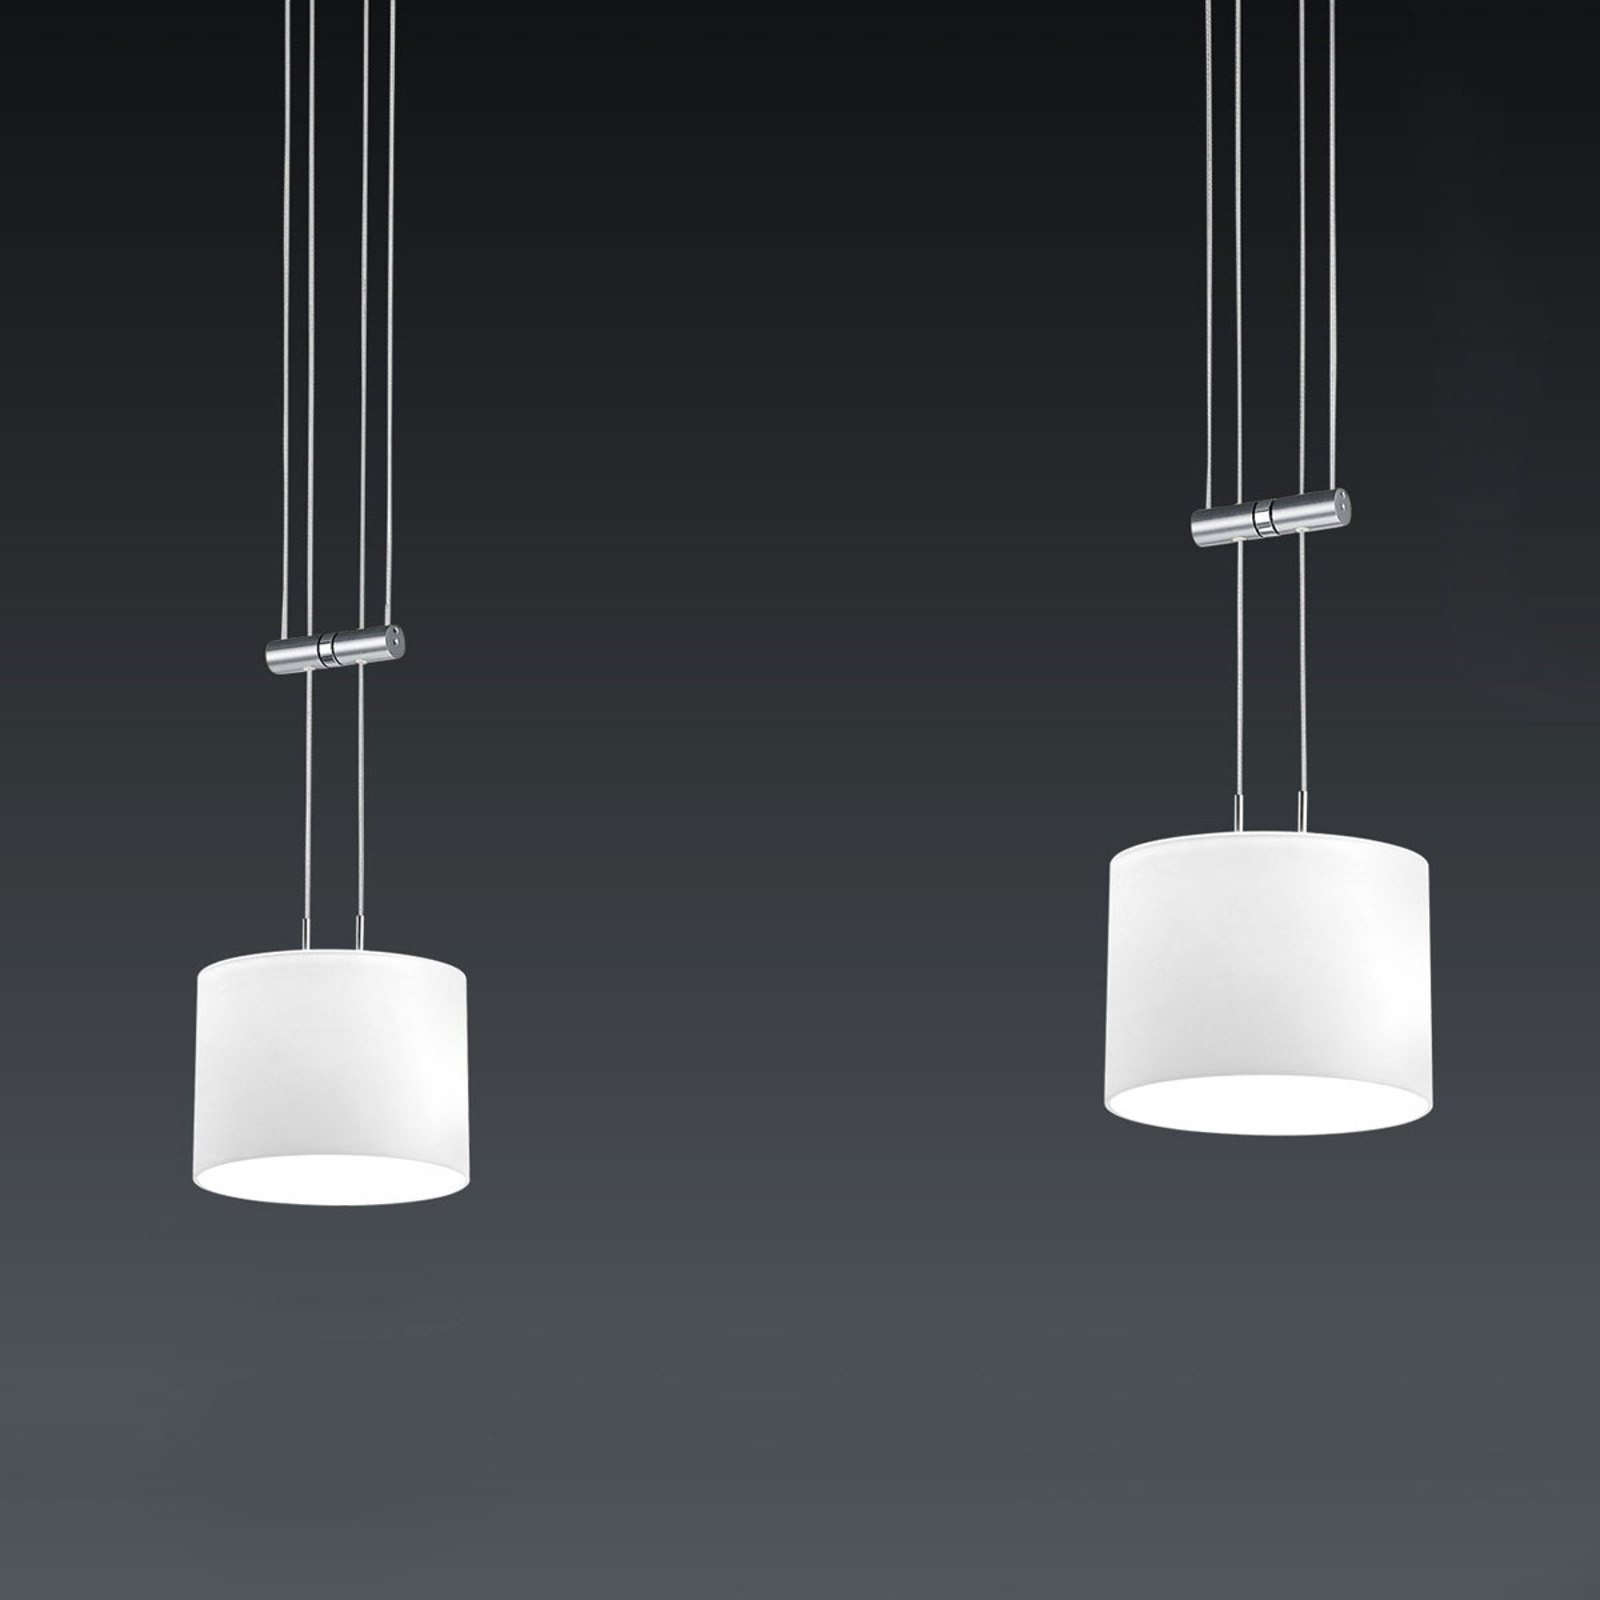 BANKAMP Grazia LED-Hängeleuchte , ZigBee-fähig 2fl